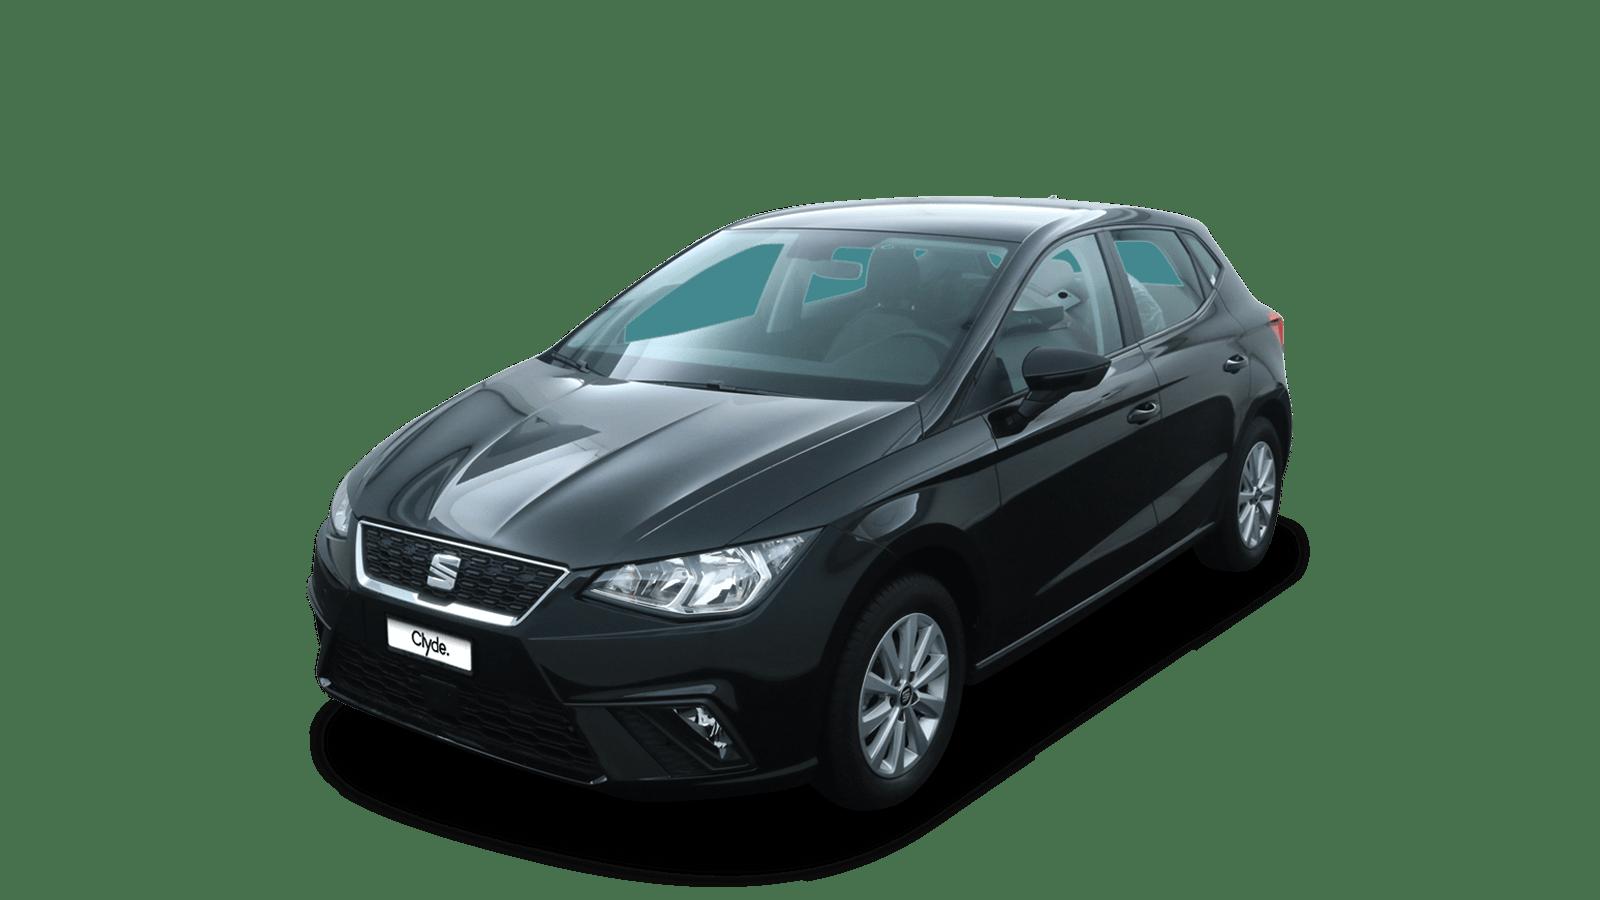 SEAT Ibiza Schwarz front - Clyde Auto-Abo